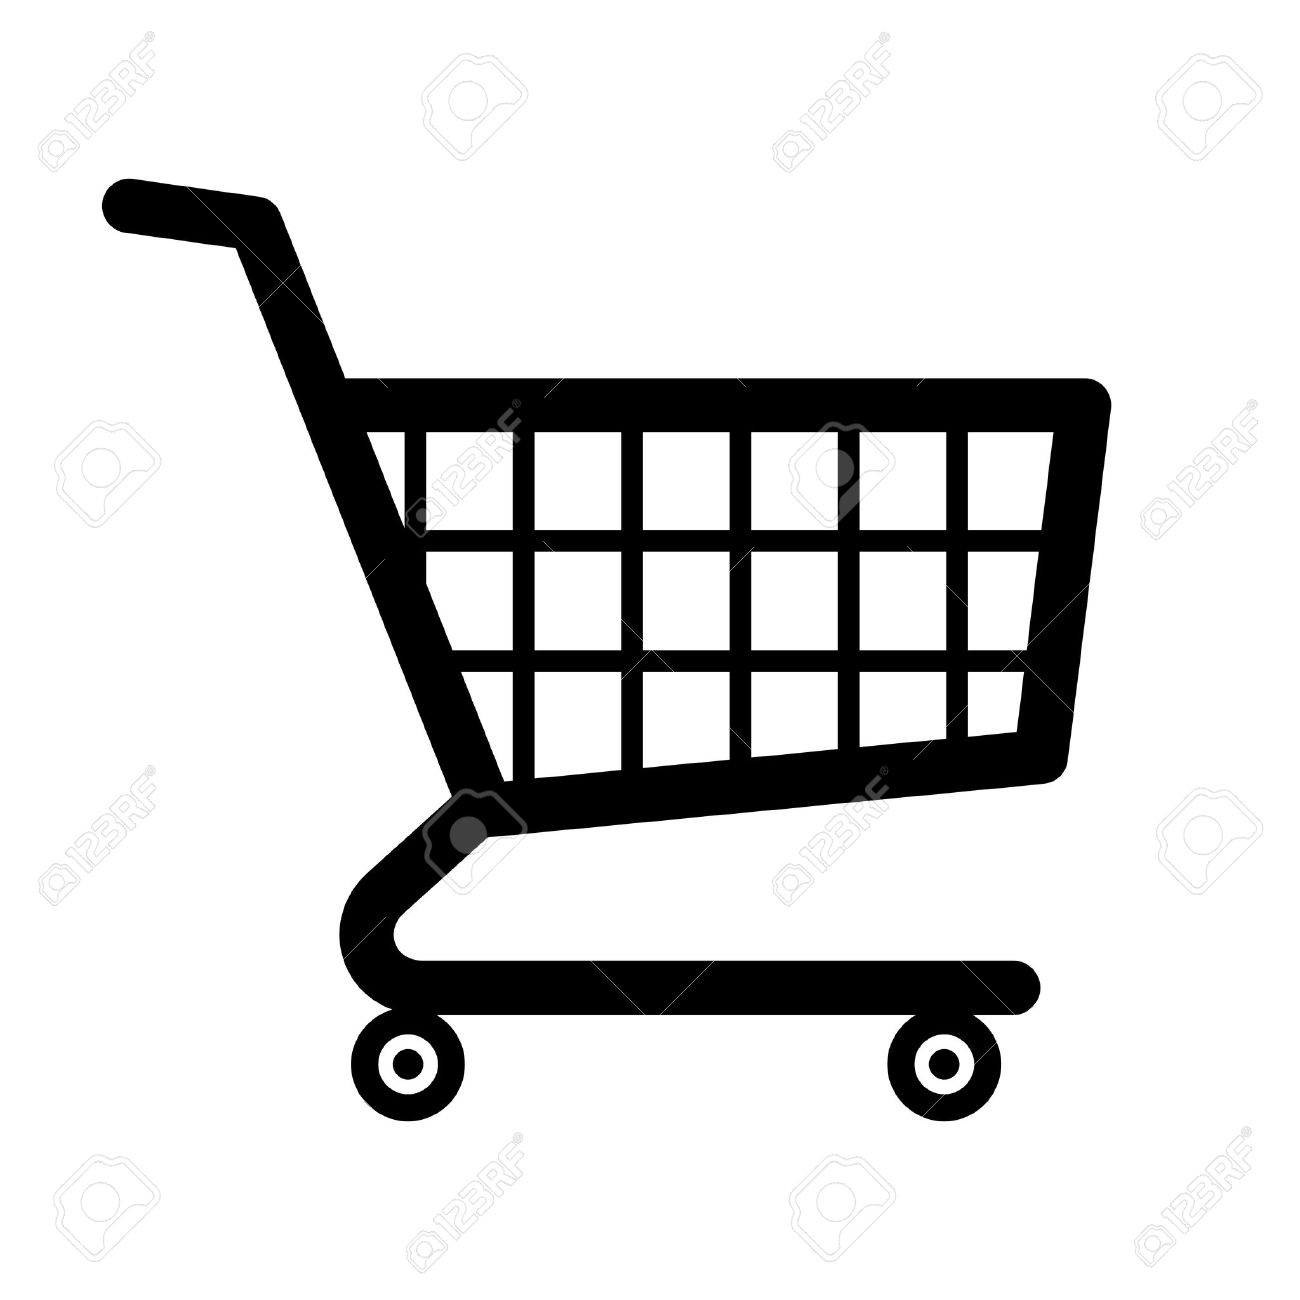 Shopping cart icon - 54302308